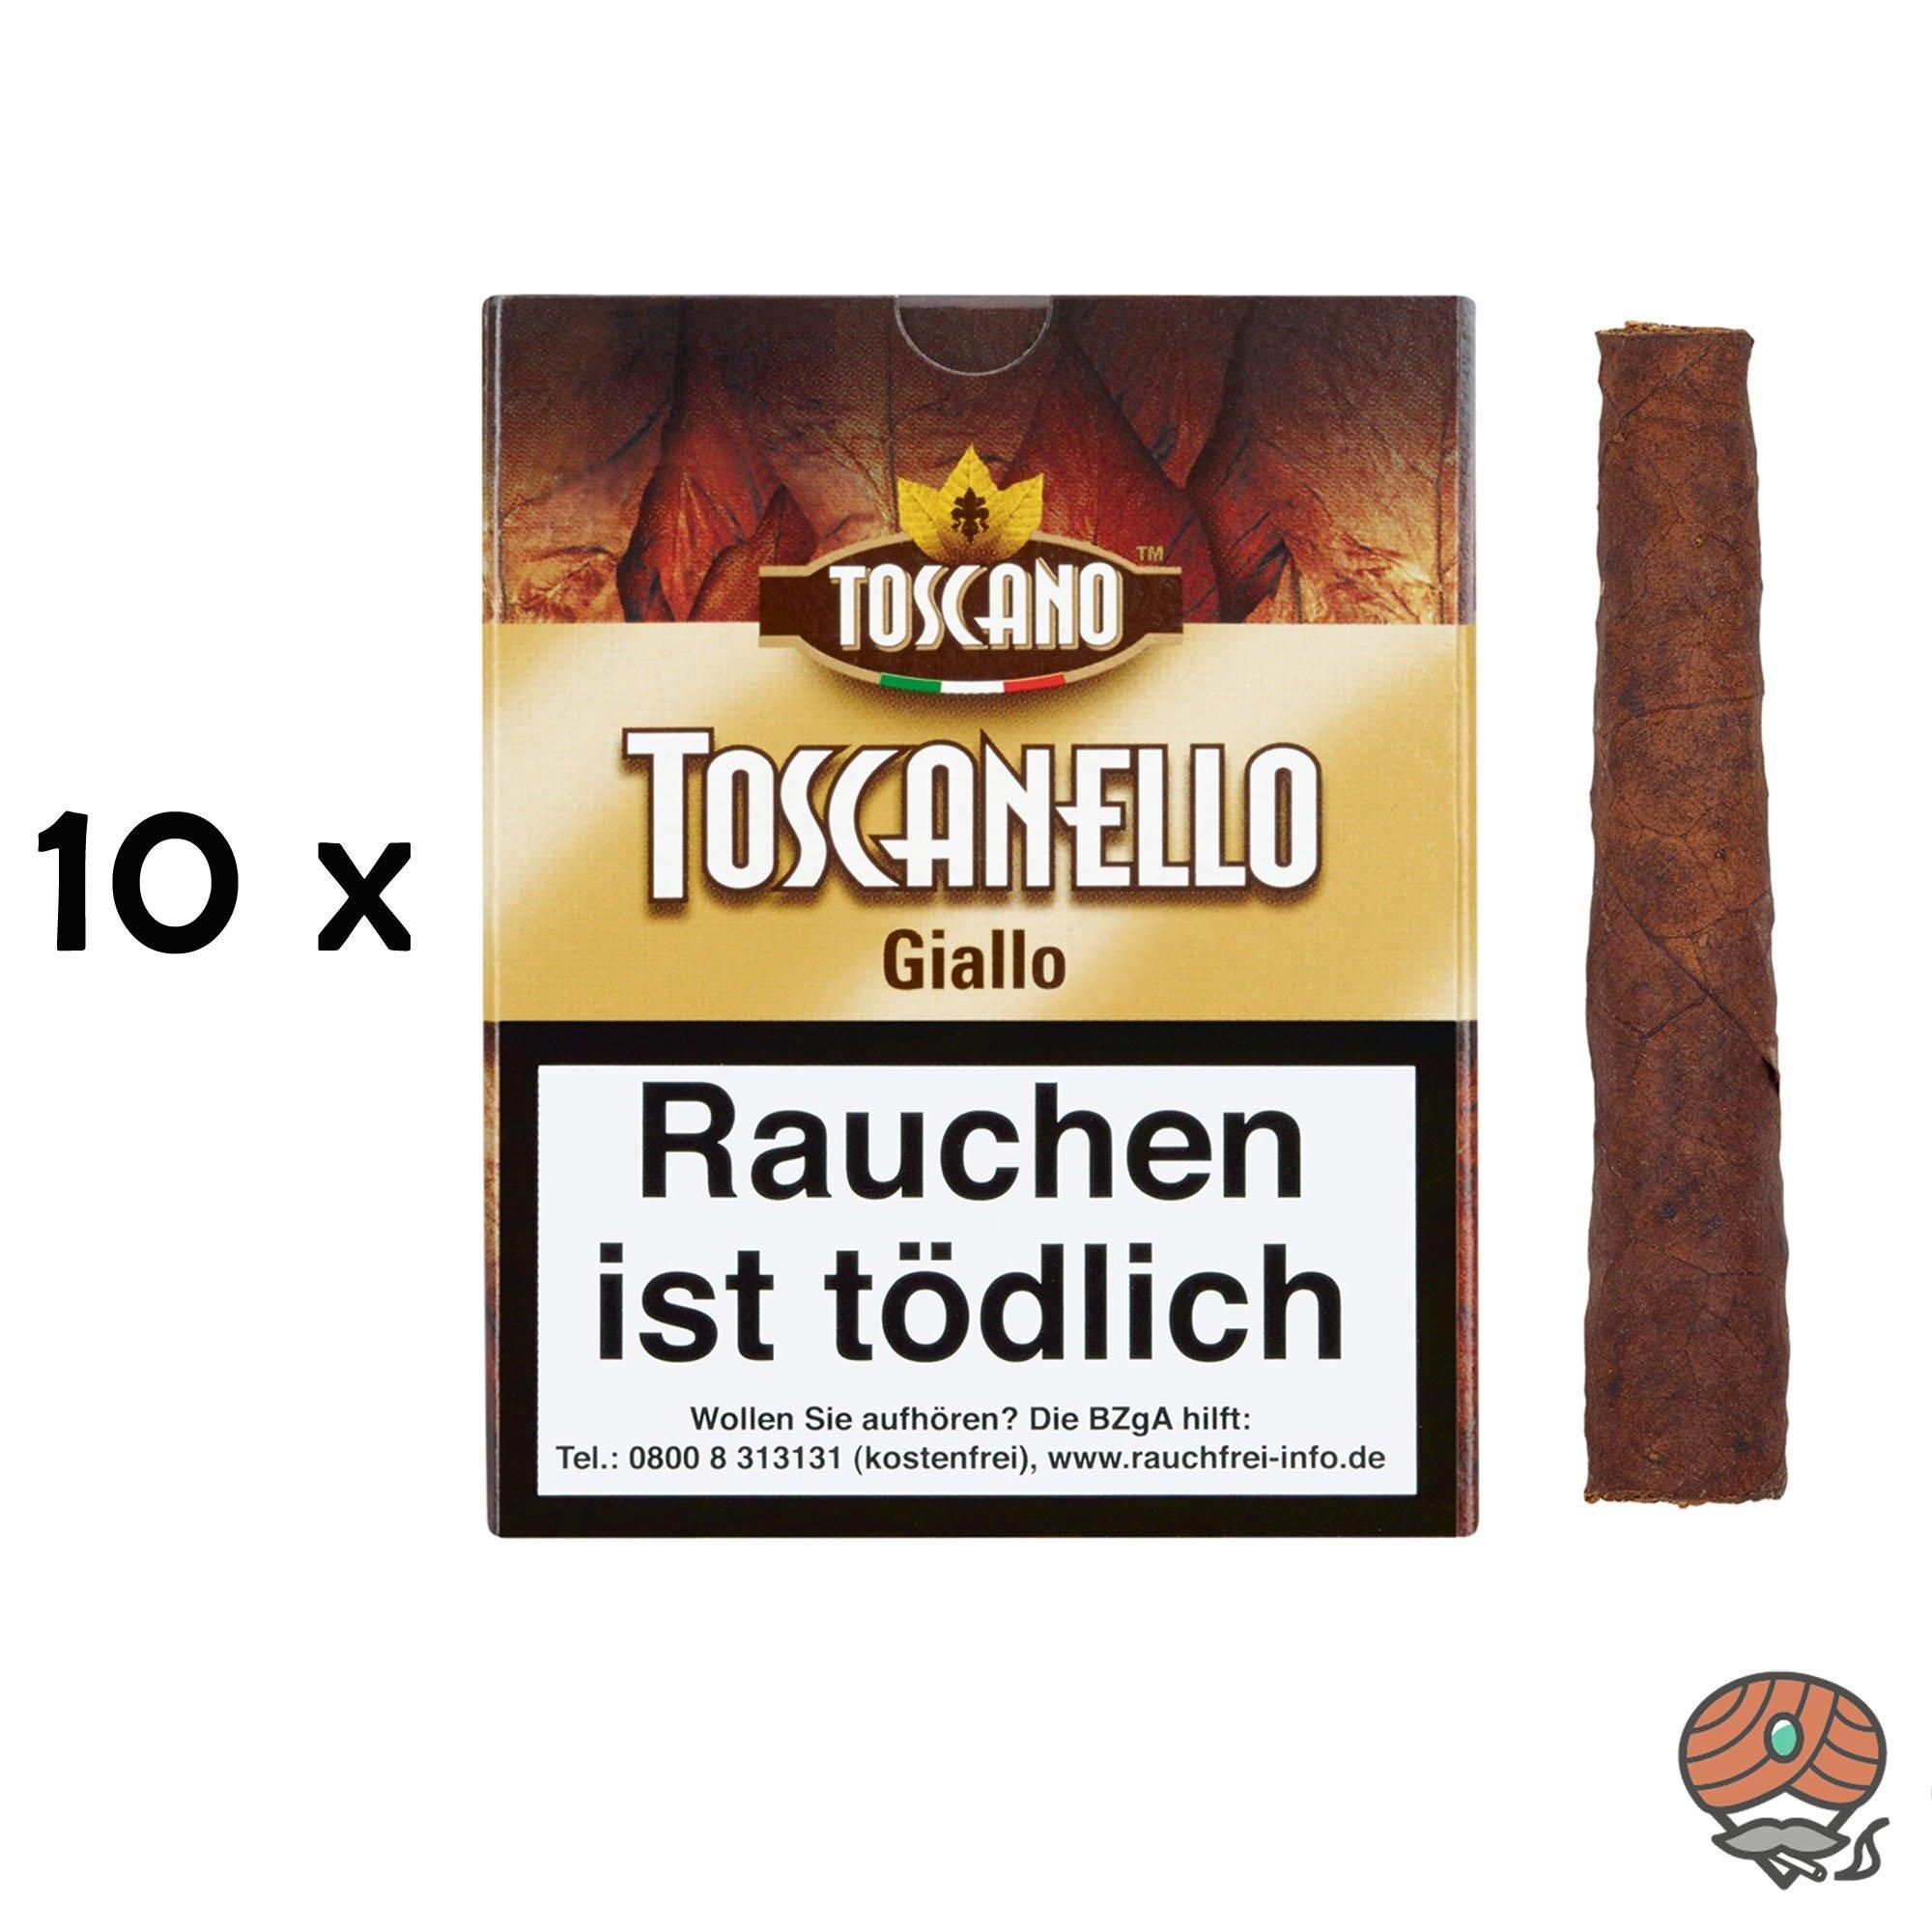 10 x Toscanello Giallo (Vanille) Zigarren